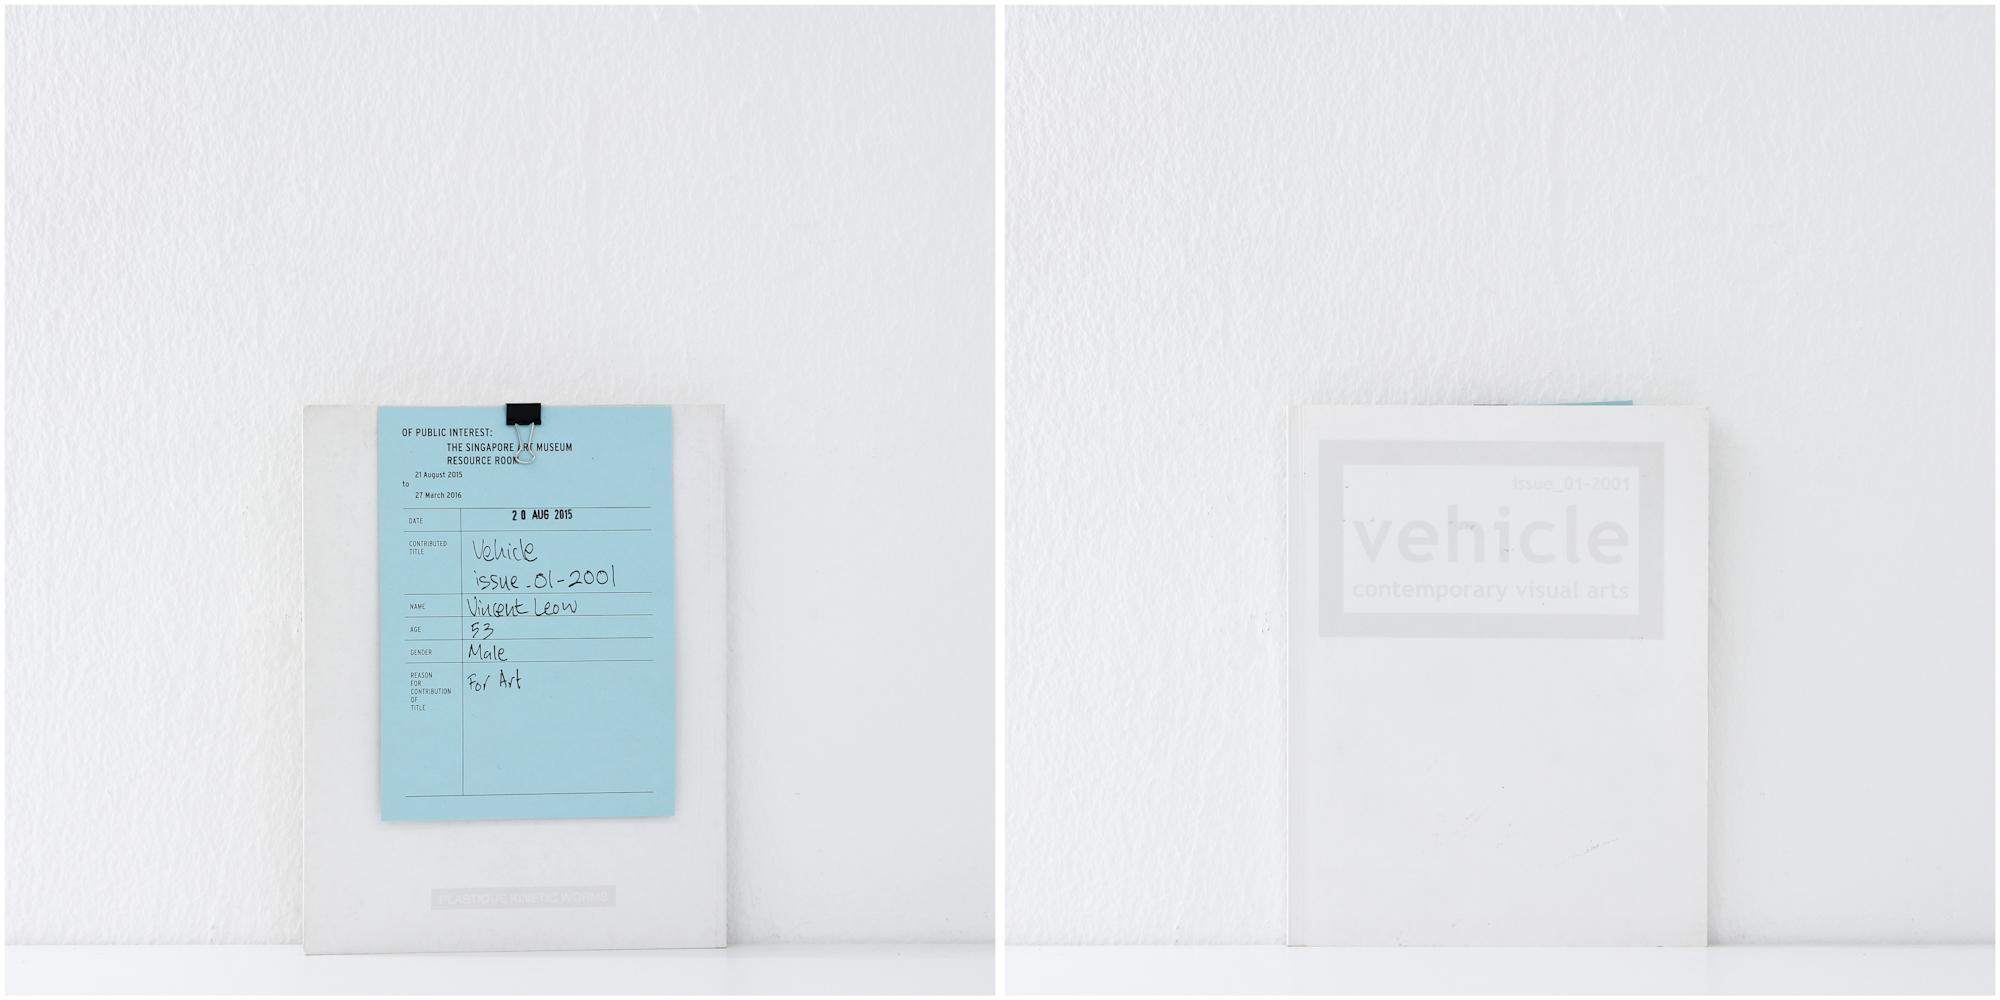 'Vehicle Issue_01-2001', 20/8/15, Vincent Leow, 53, Male